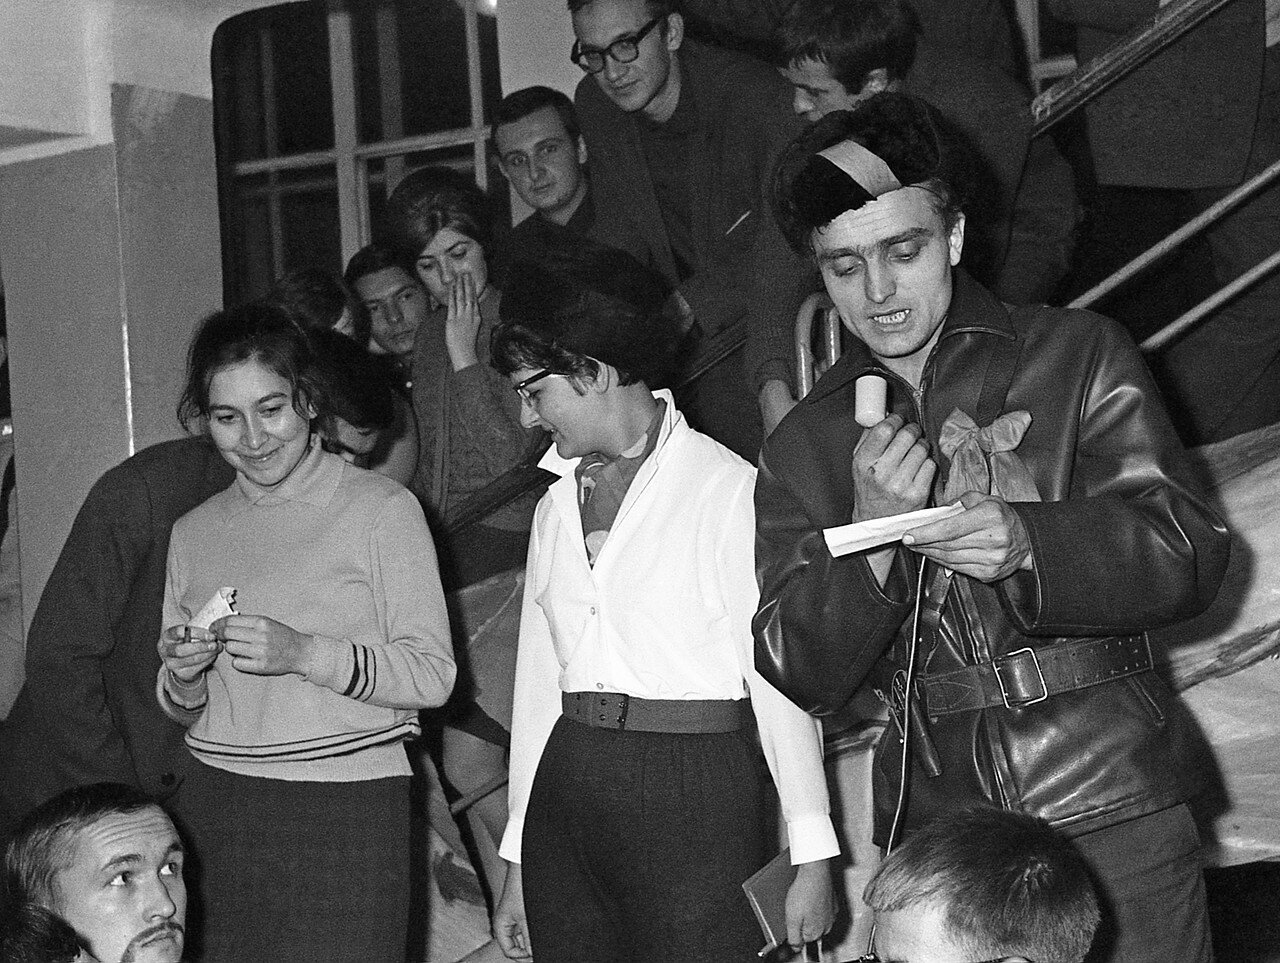 41. С микрофоном комиссар Валера Коковкин, справа от него Таня Ланцова